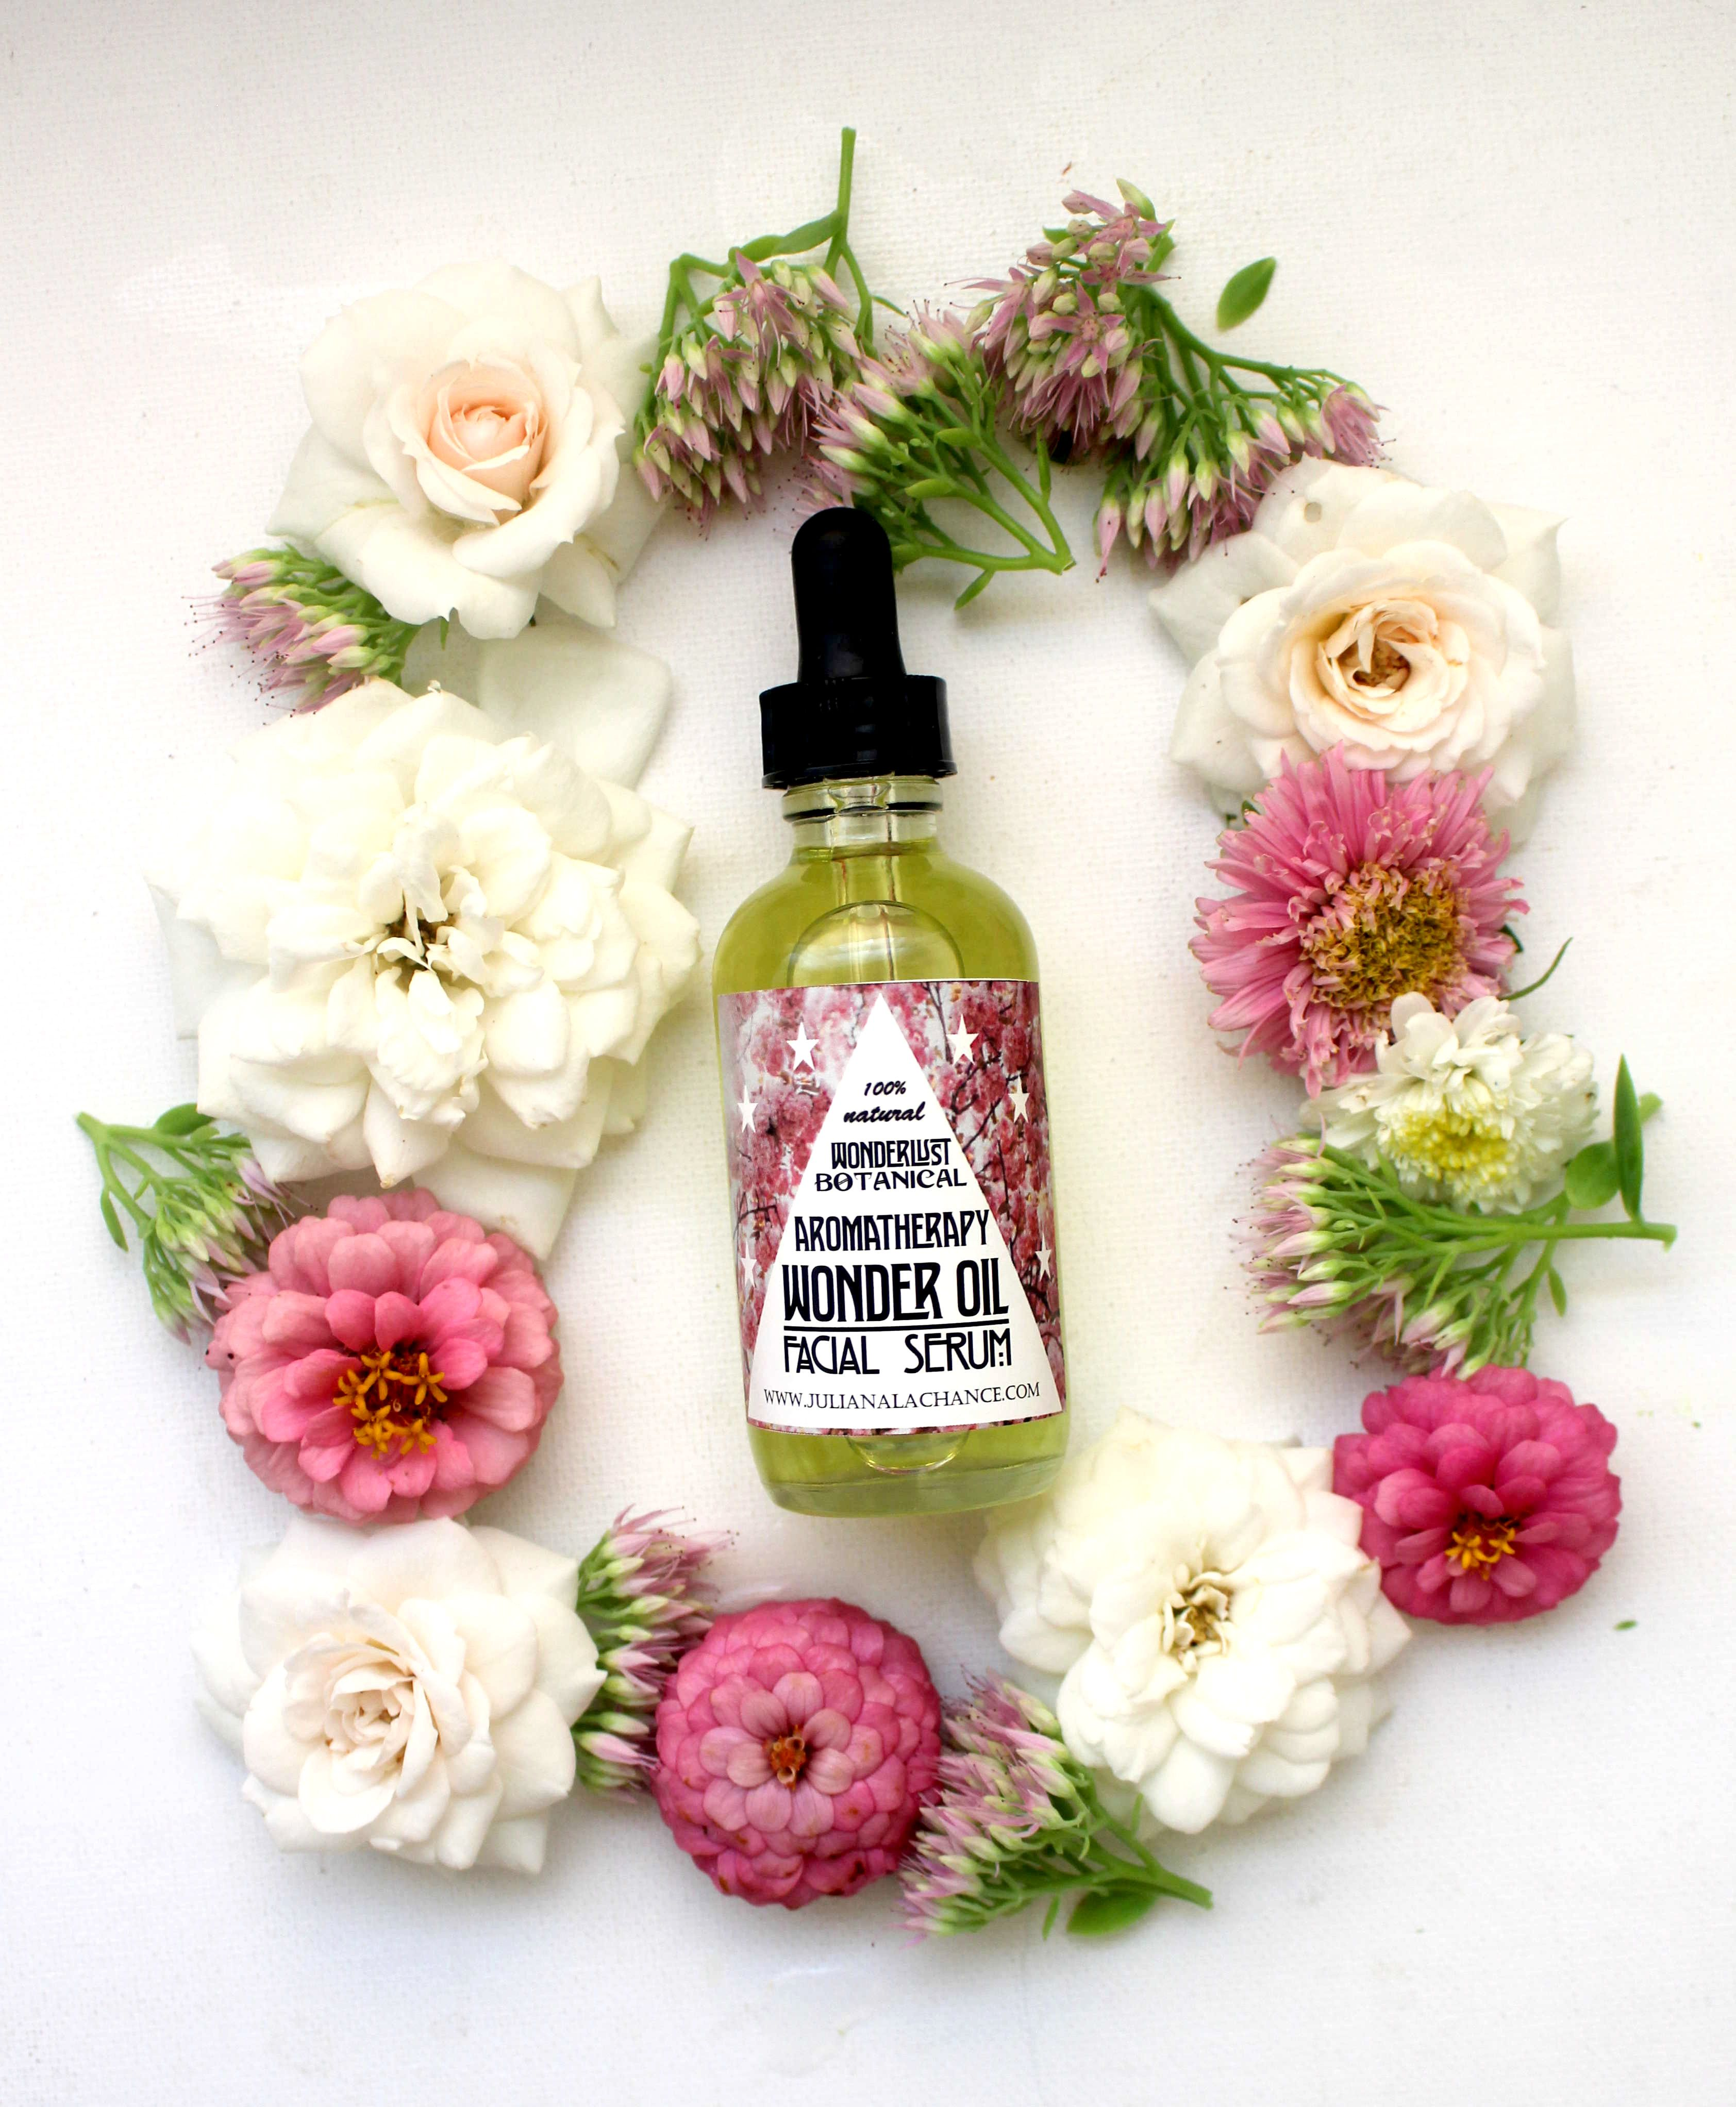 Wonder Oil Facial Serum #jojobaoil